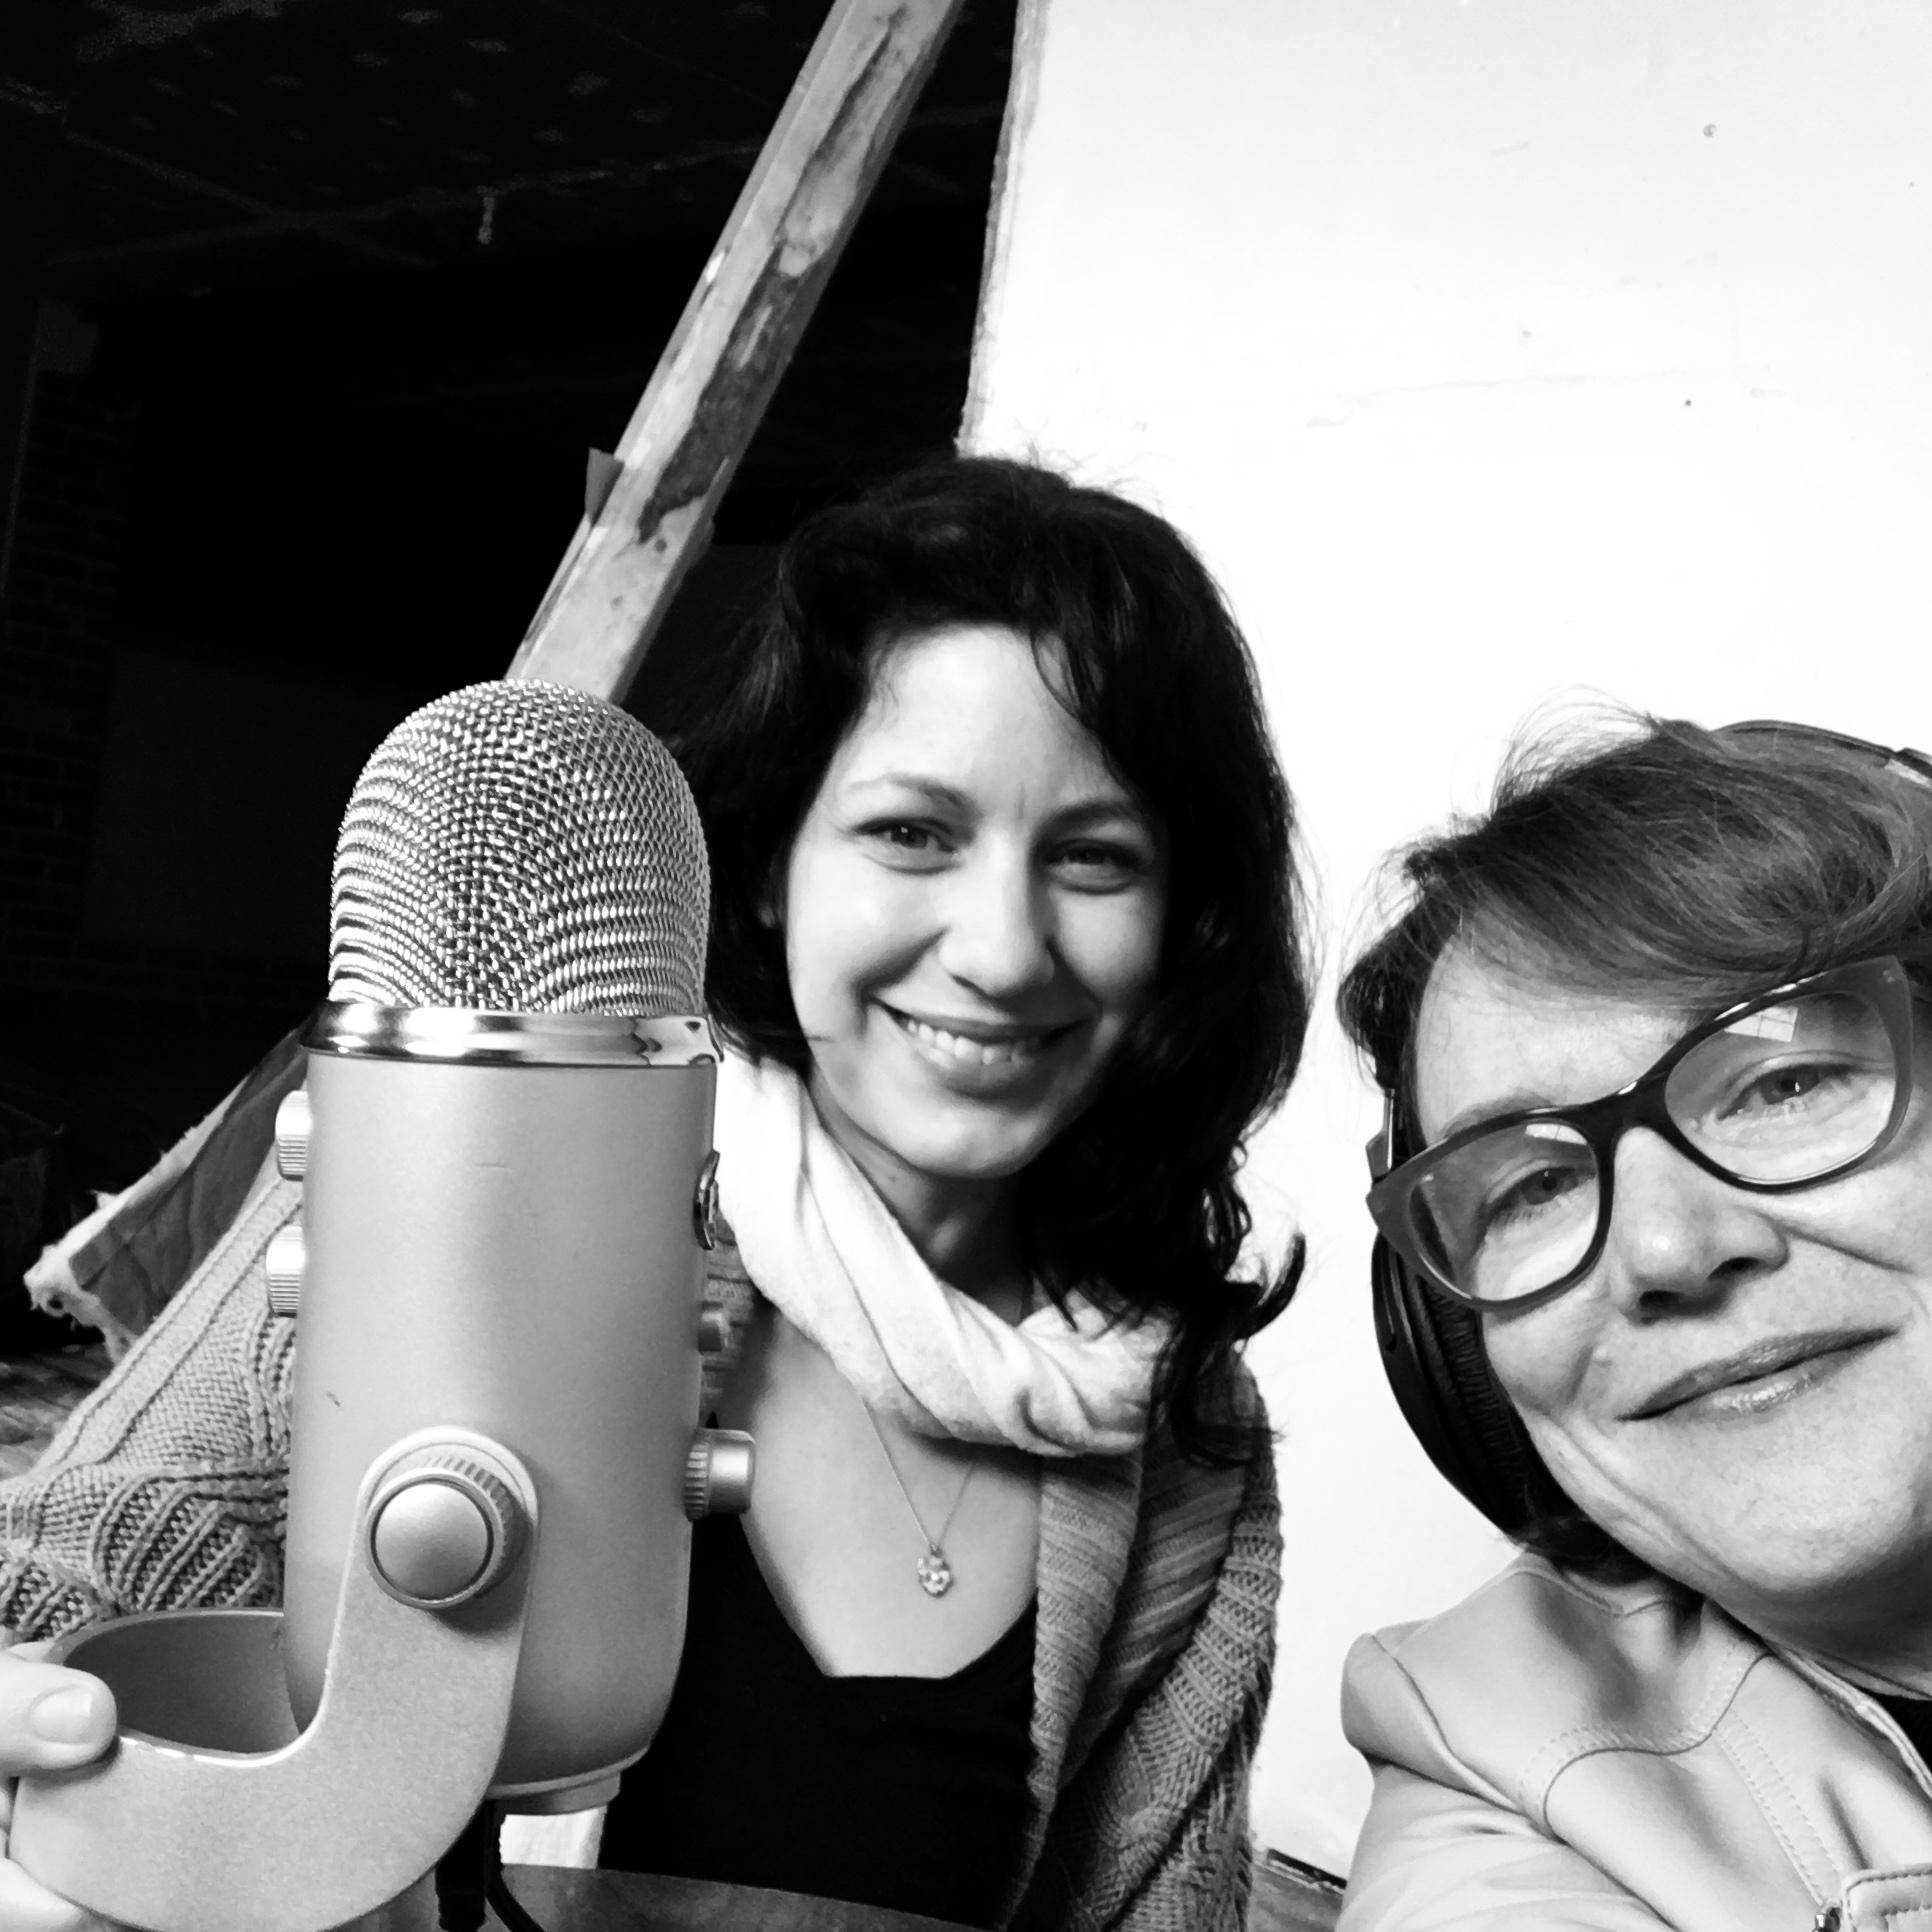 Tatiana Veneruso (L) and Vivian Liddell (R) recording at Trio Gallery.